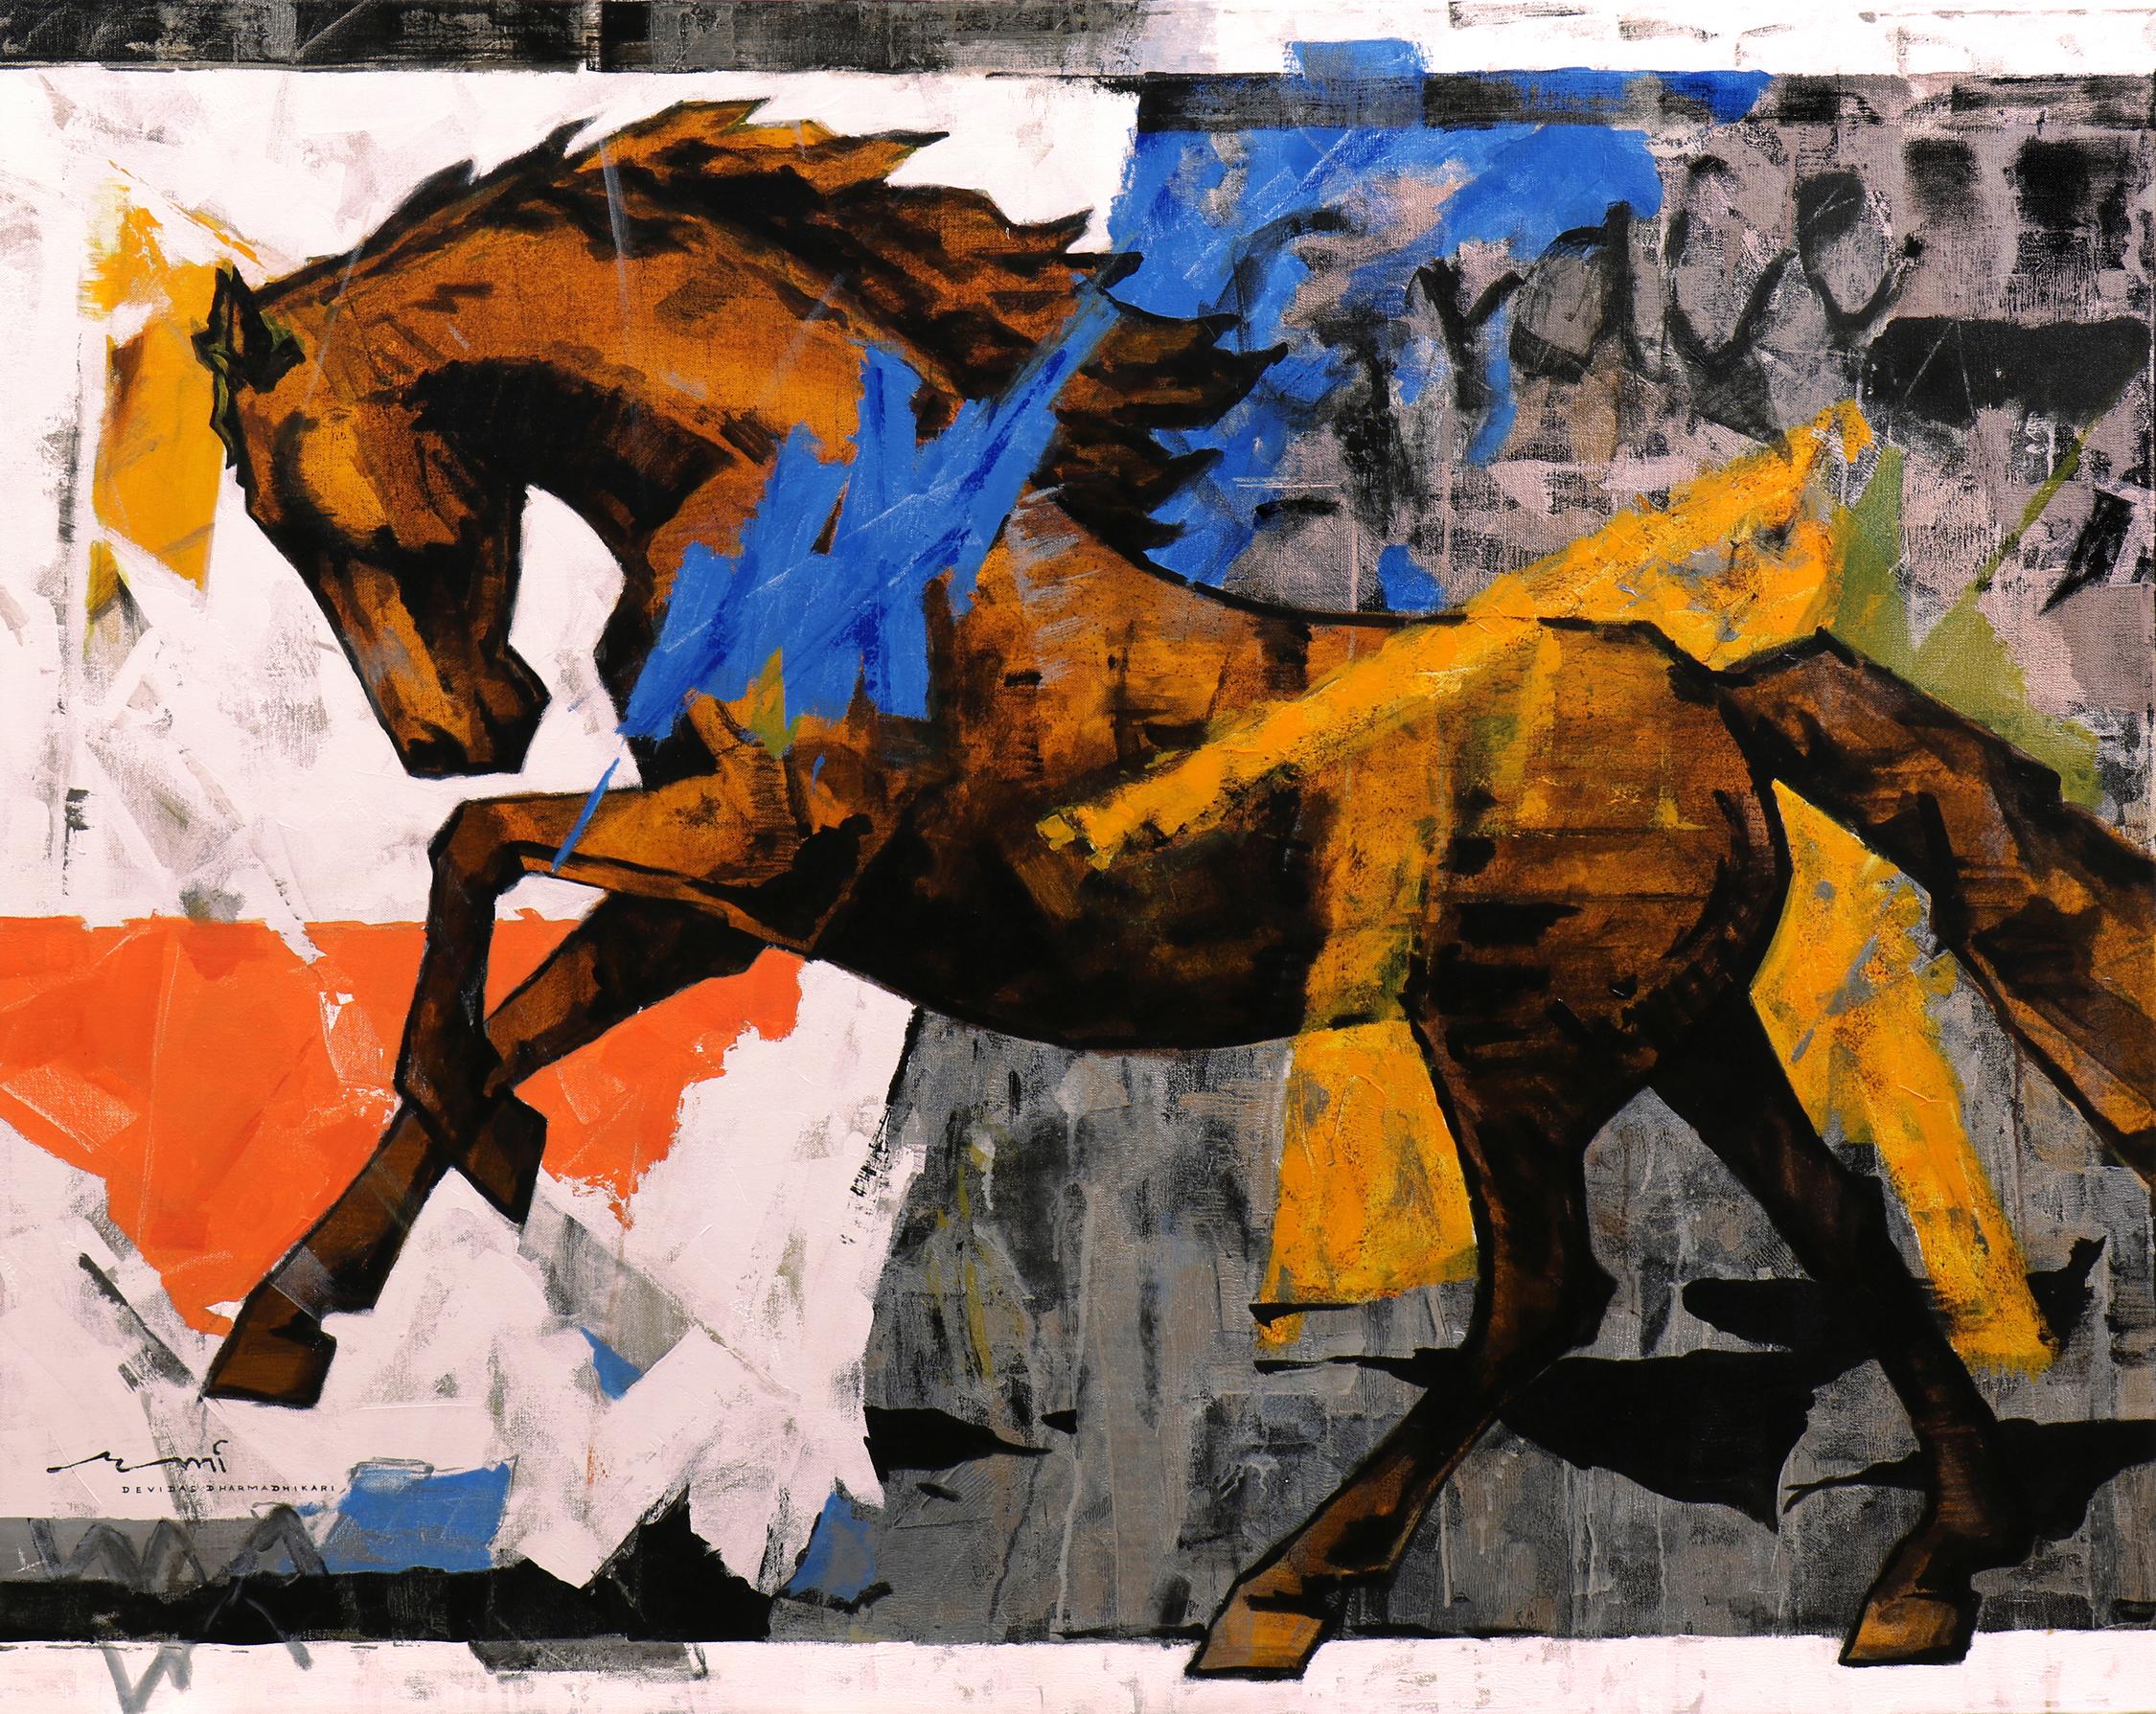 HORSE-177, Acrylic on canvas, Size-60x48